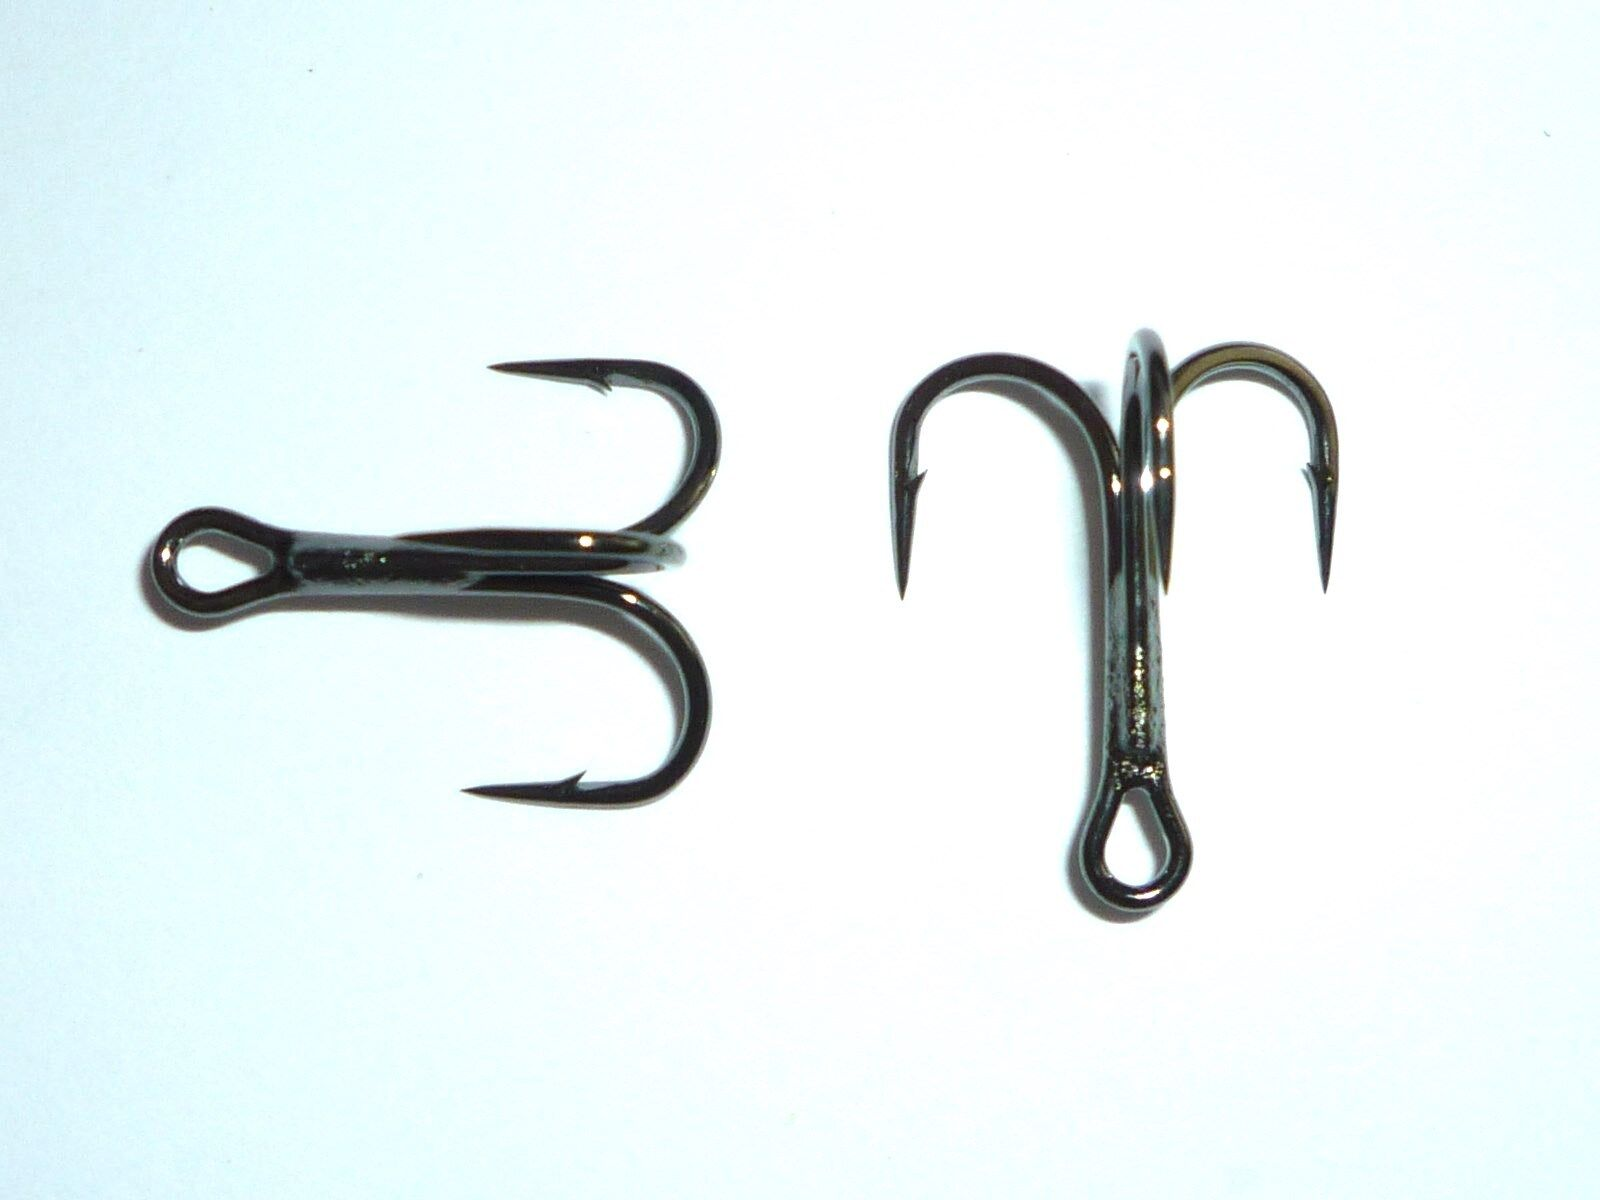 100 Mustad KVD-Elite Round-Bend 1X Treble Hooks (Size 2) TR78NP-BN UltraPoint